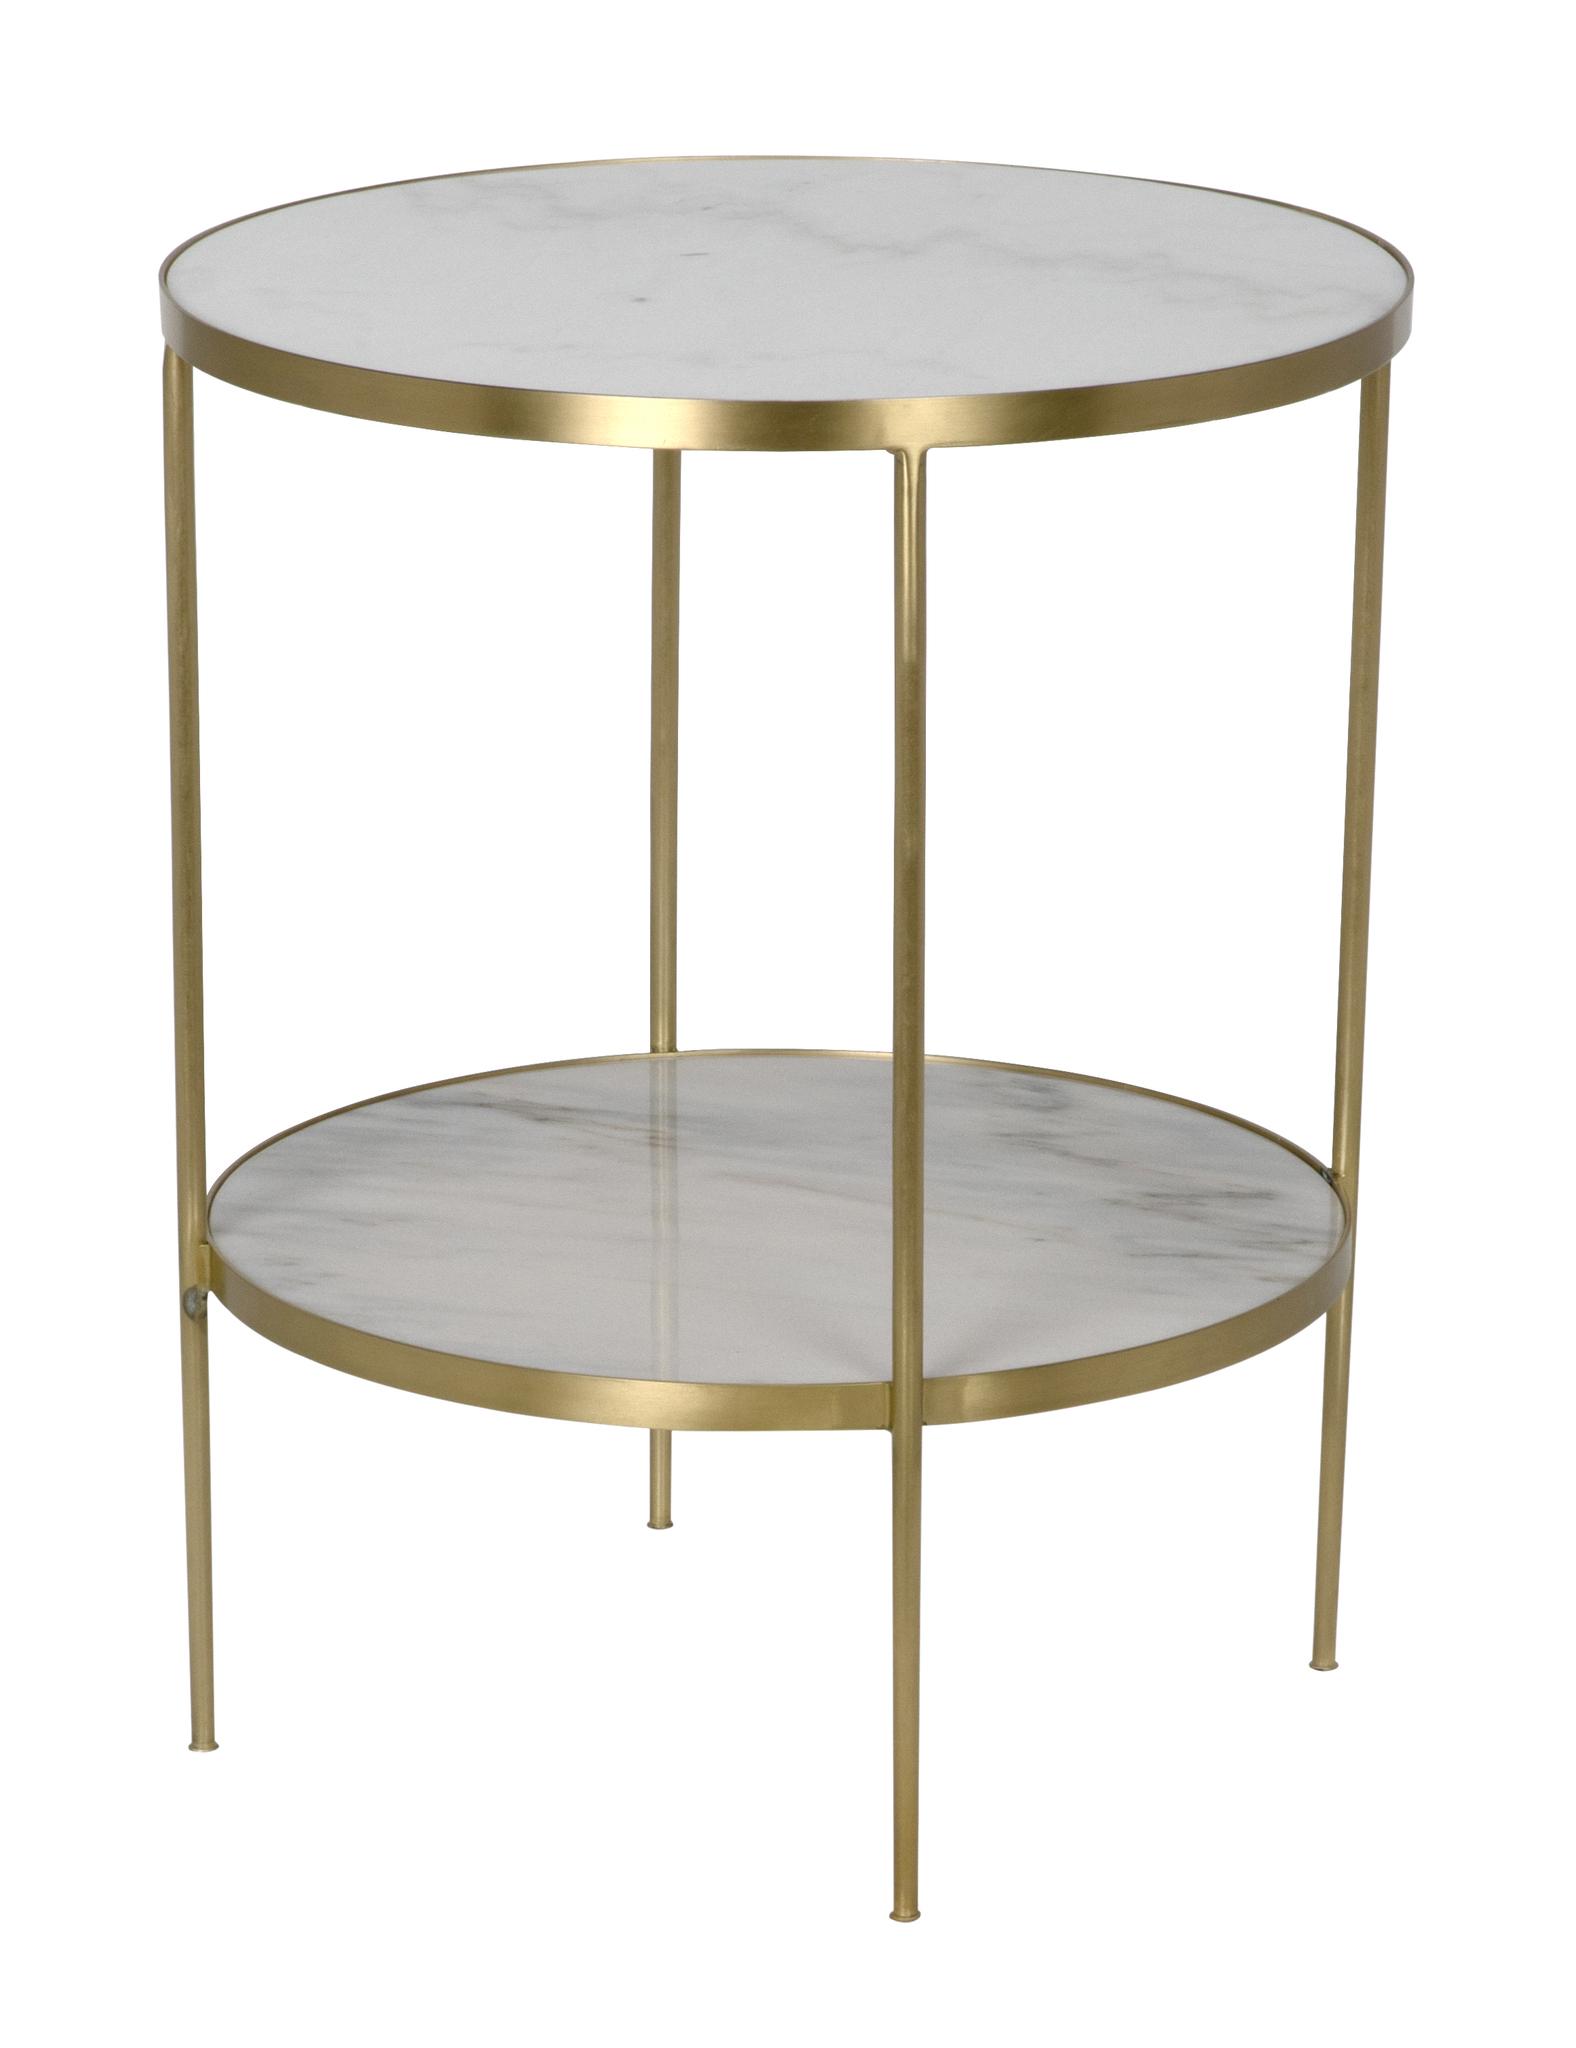 QS Rivoli Side Table Antique Brass Metal and Quartz accent tables